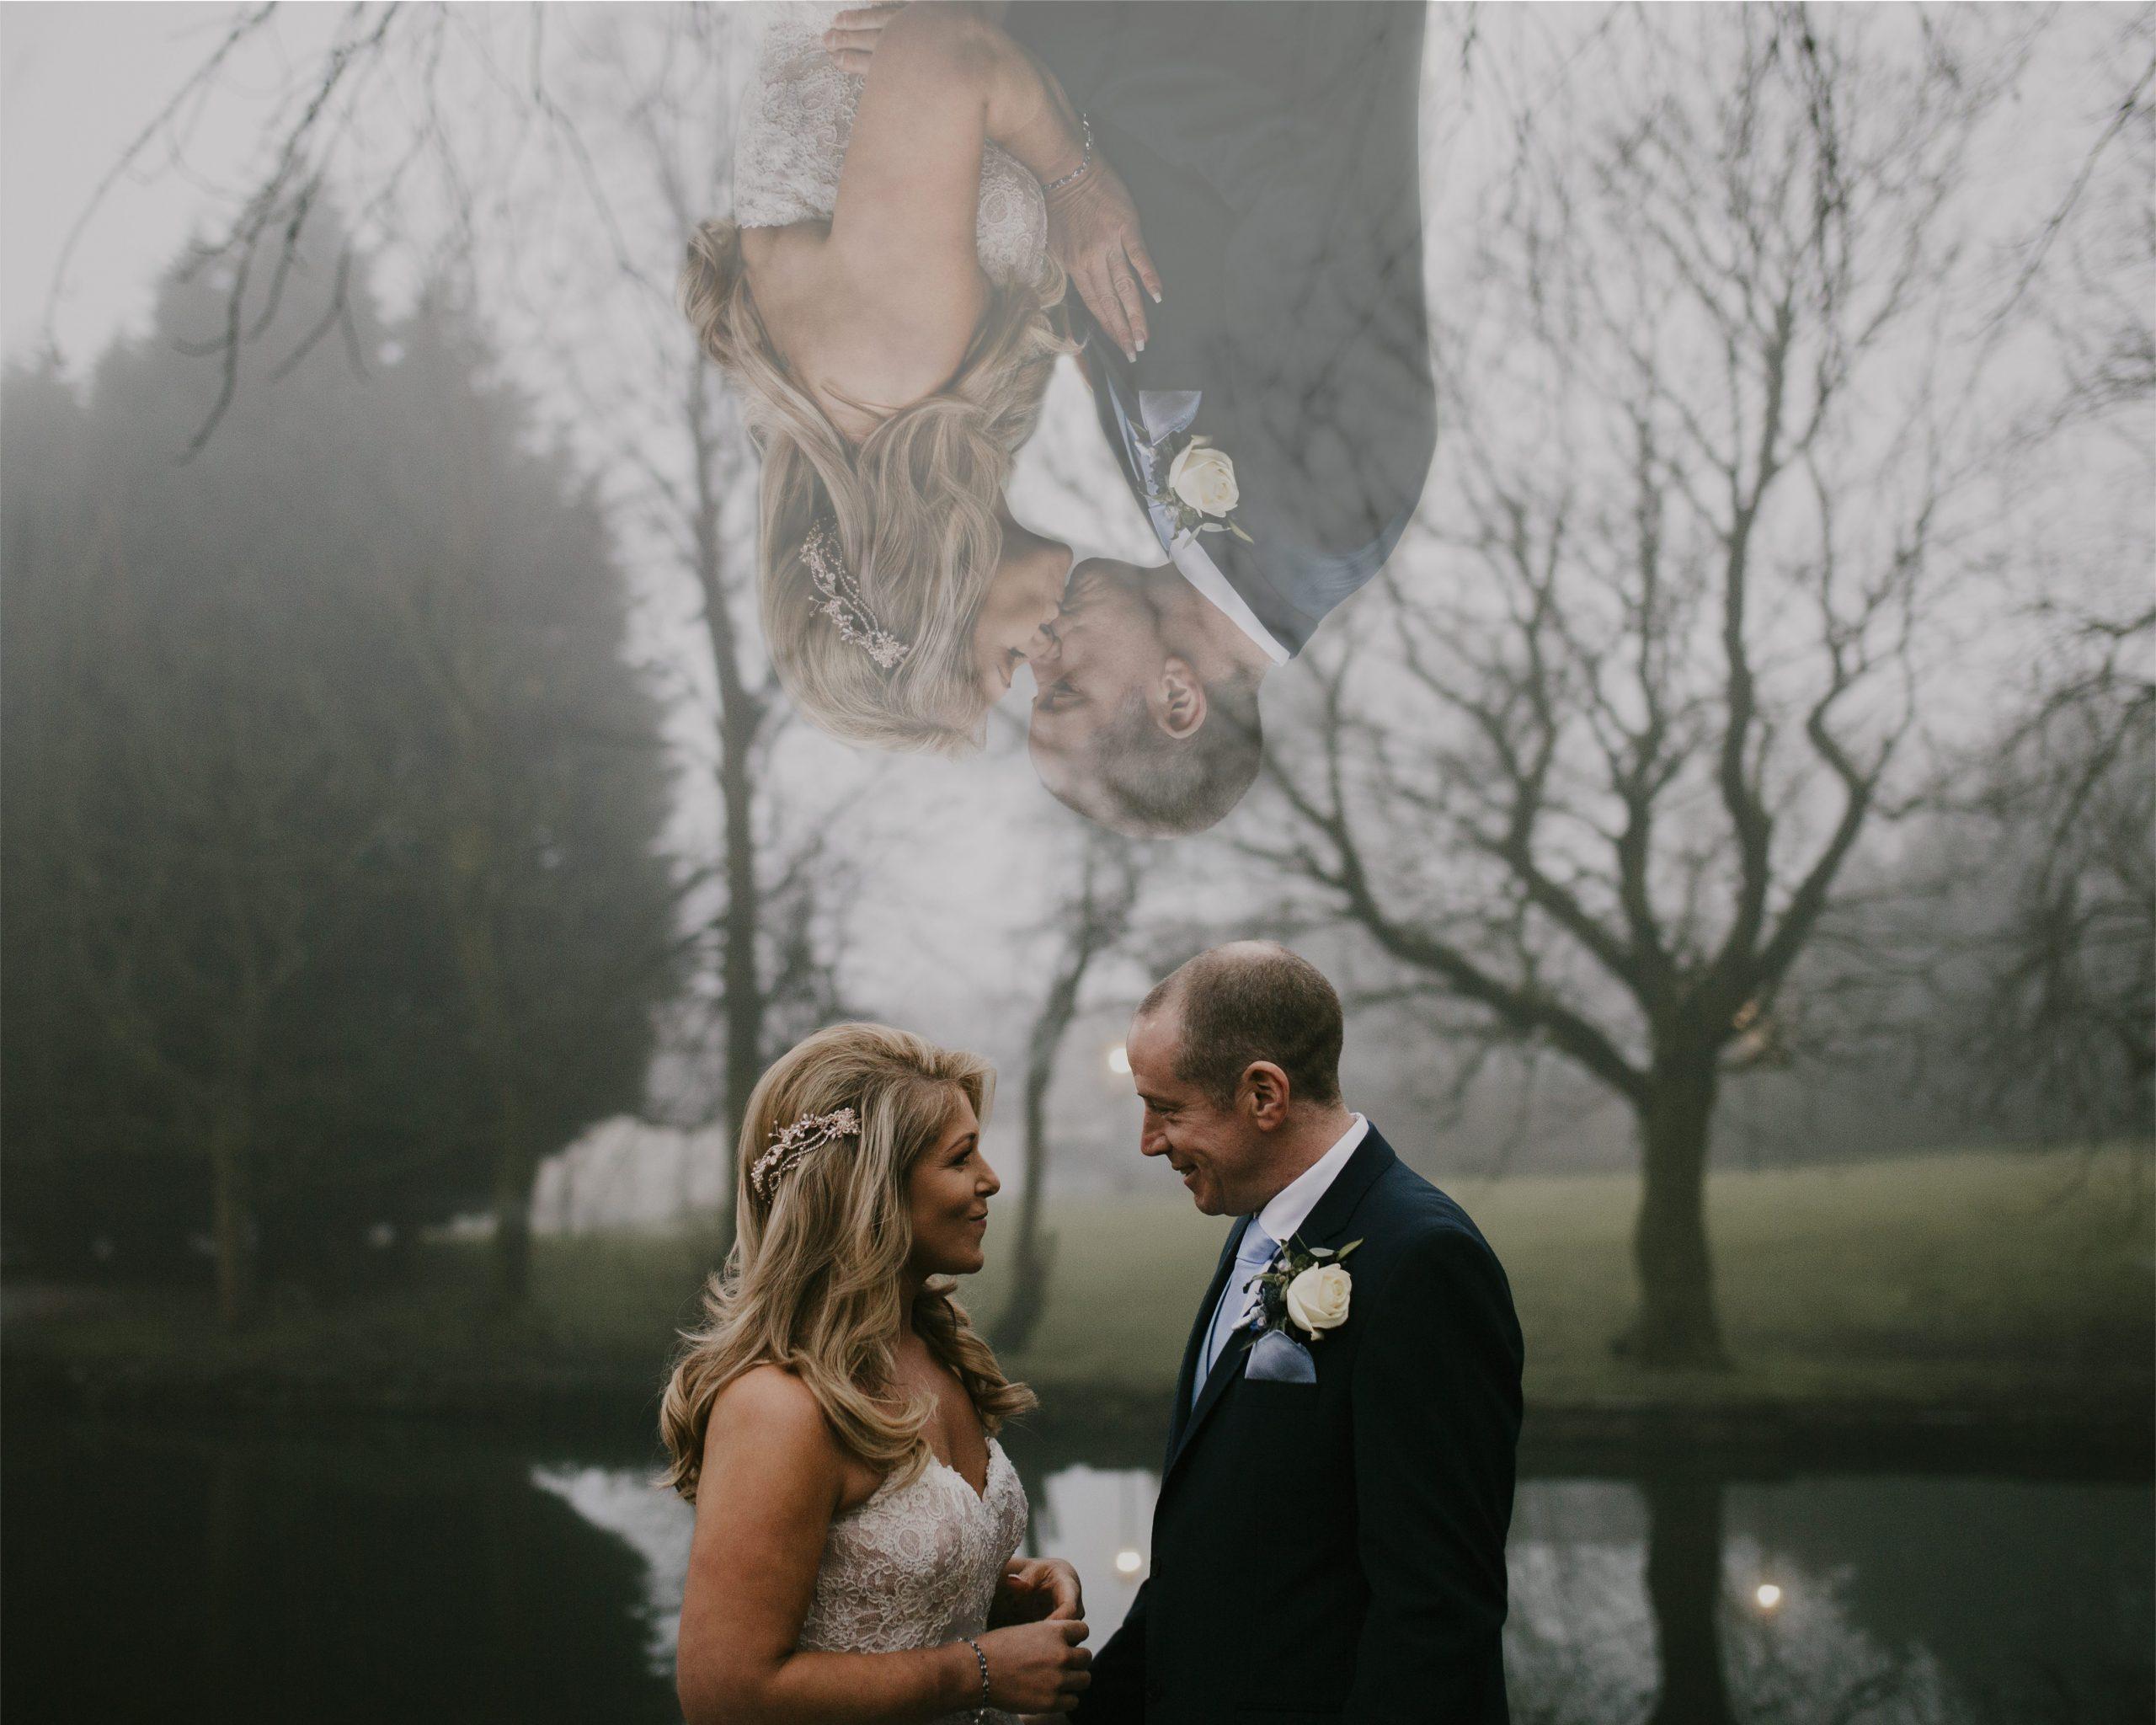 Lancashire wedding photographer, intimate wedding